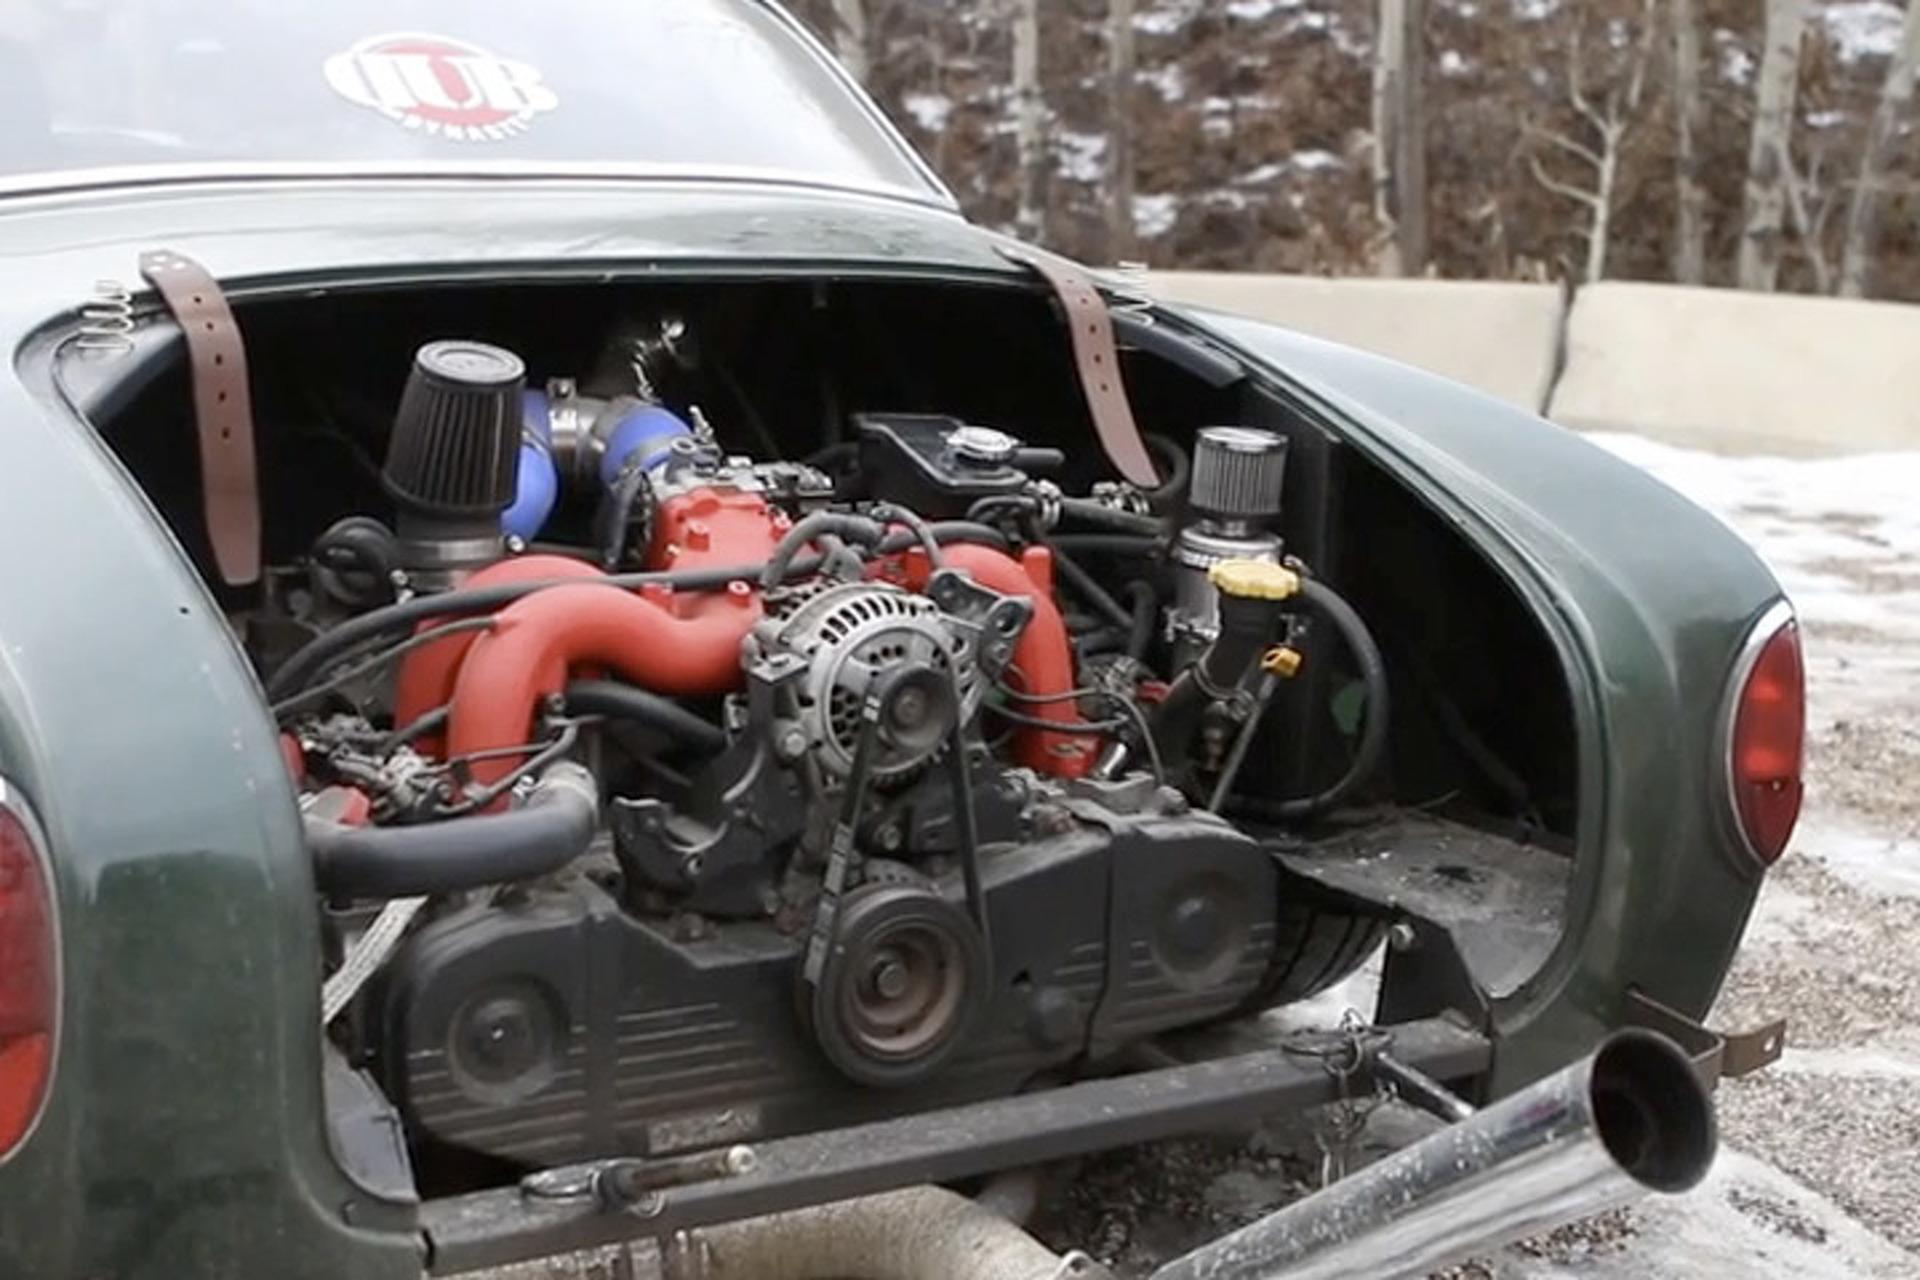 Subaru Swapped Karmann Ghia is one 'Cool' Daily Driver